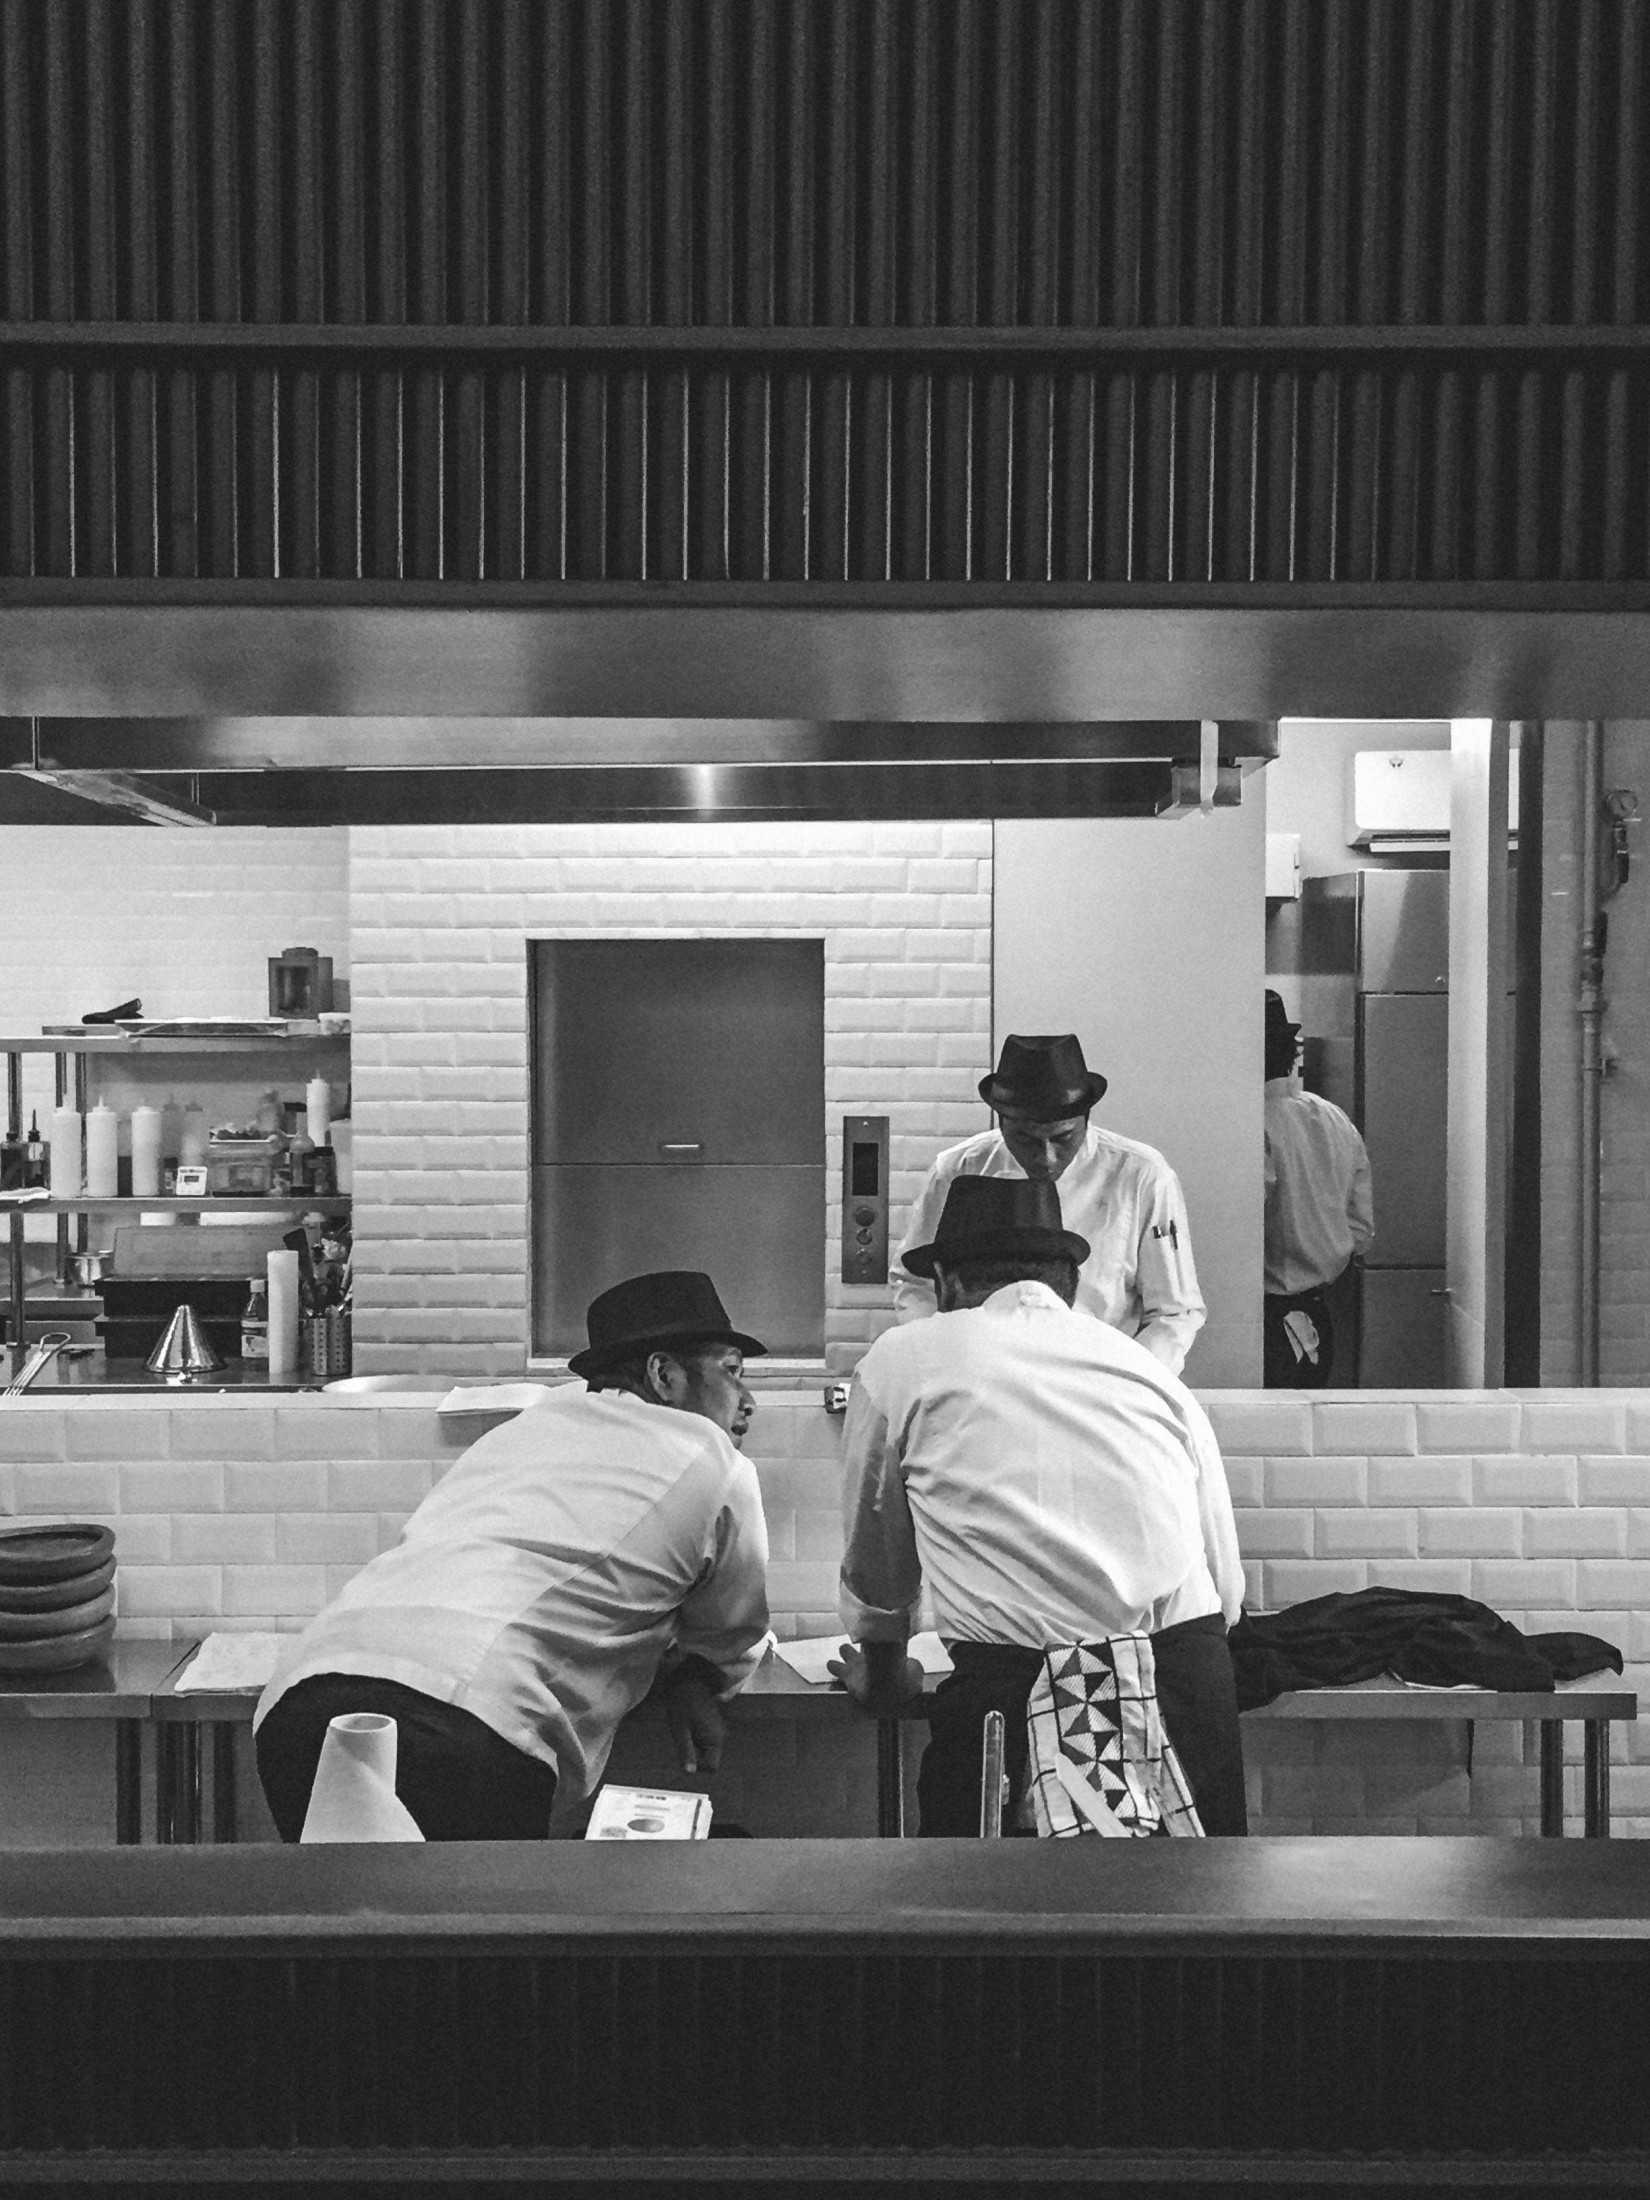 Studio Tana Lume Restaurant Jakarta, Daerah Khusus Ibukota Jakarta, Indonesia Jakarta, Daerah Khusus Ibukota Jakarta, Indonesia Studio-Tana-Lume-Restaurant  79595